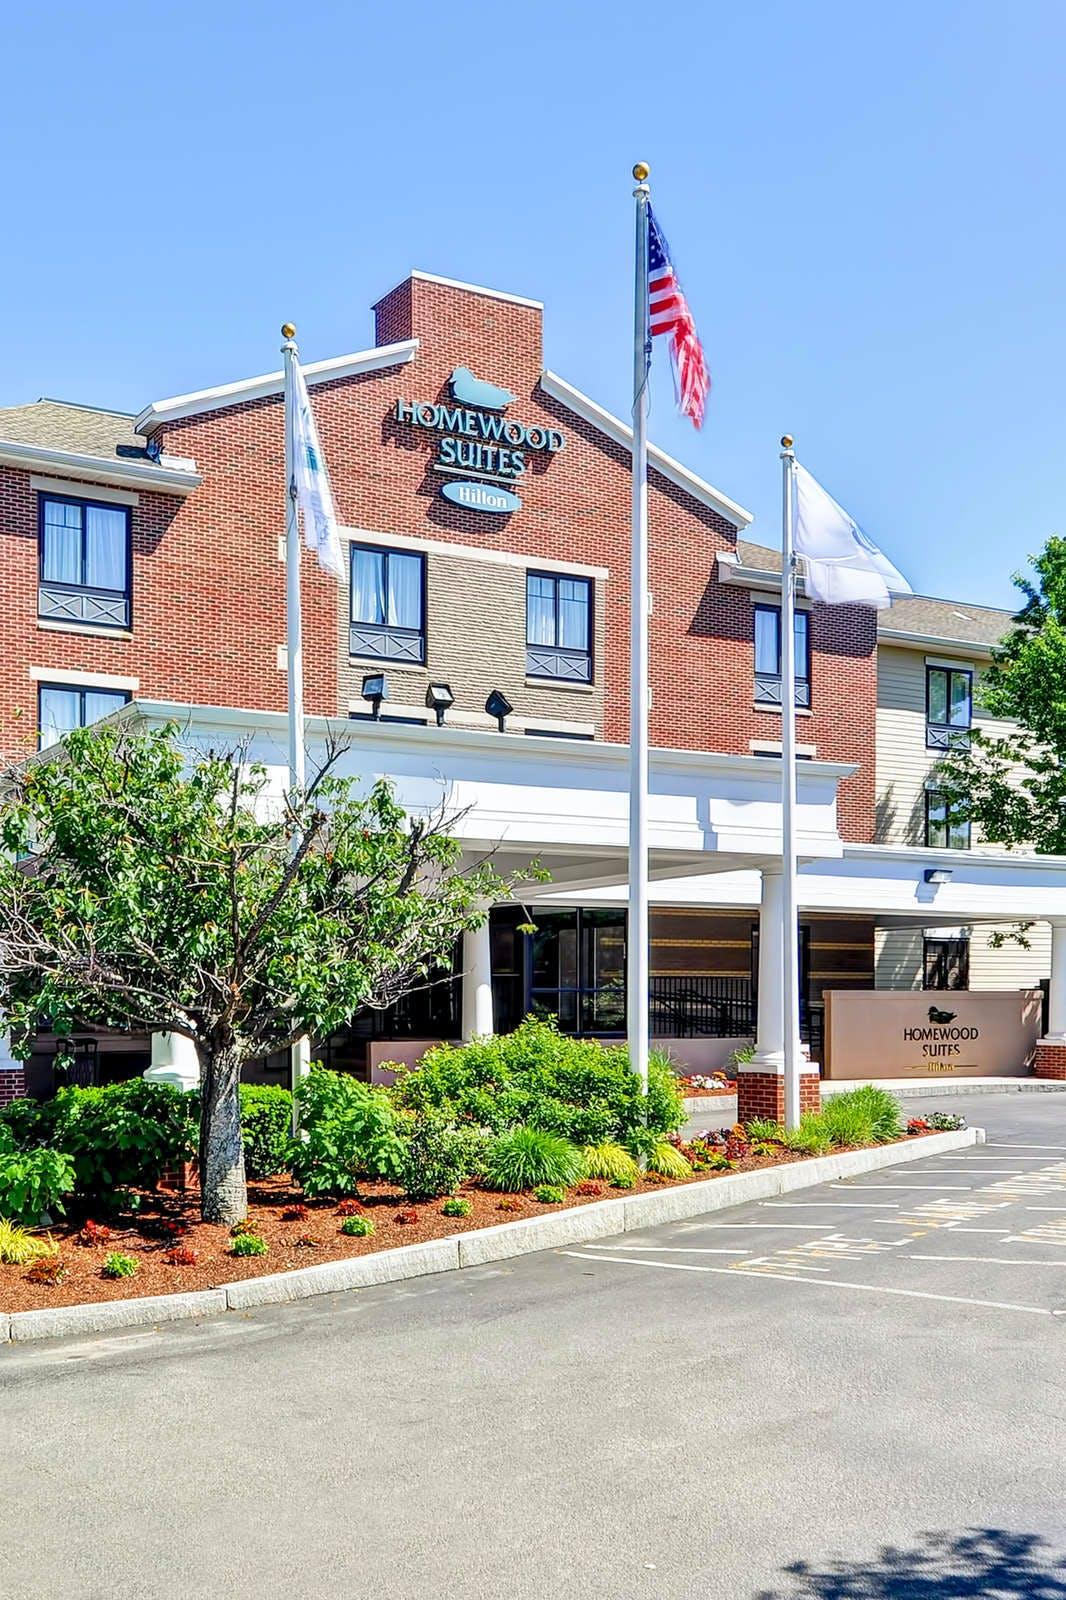 Homewood Suites by Hilton Boston/Cambridge-Arlington